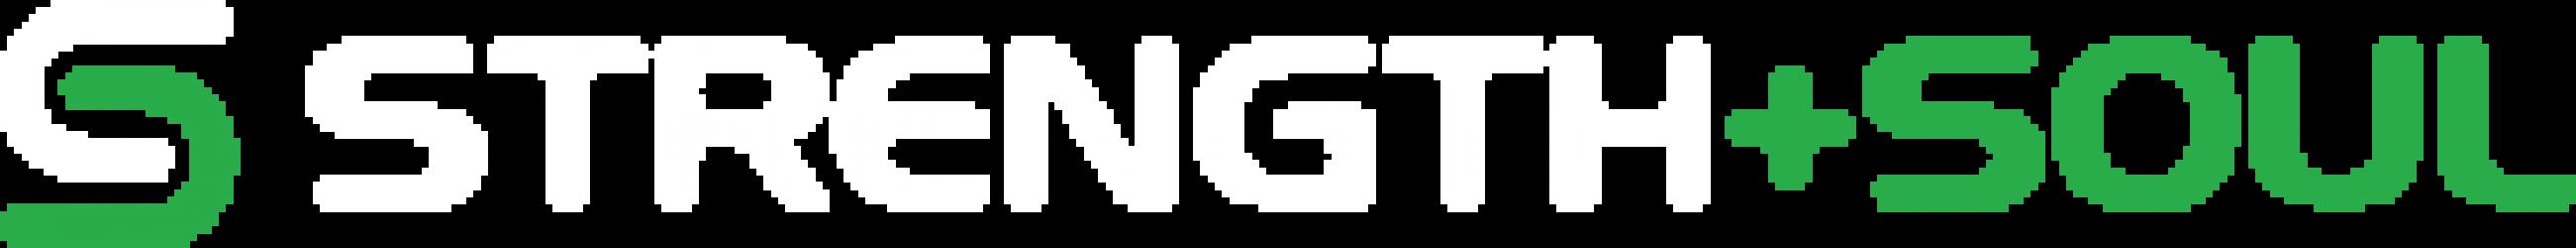 Strenth + Soul logo